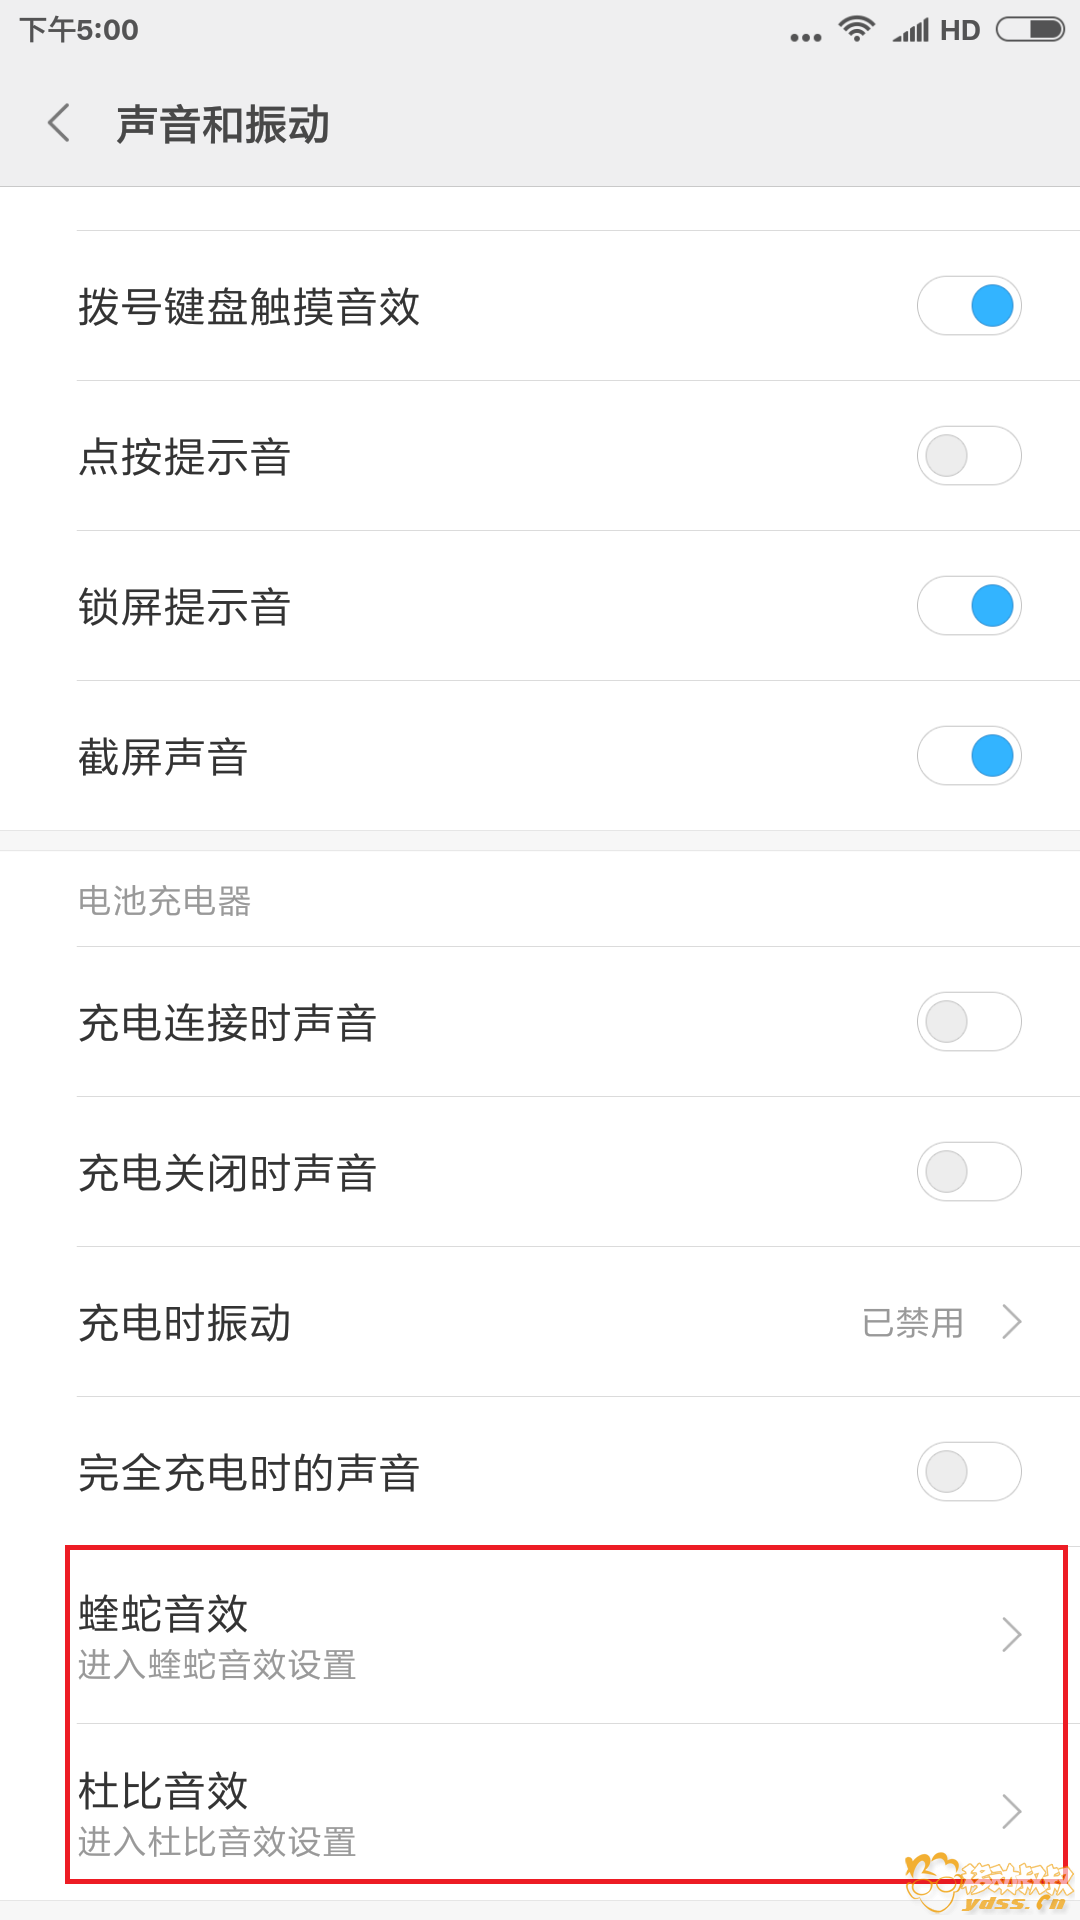 Screenshot_2018-05-19-17-00-29-809_com.android.settings.png